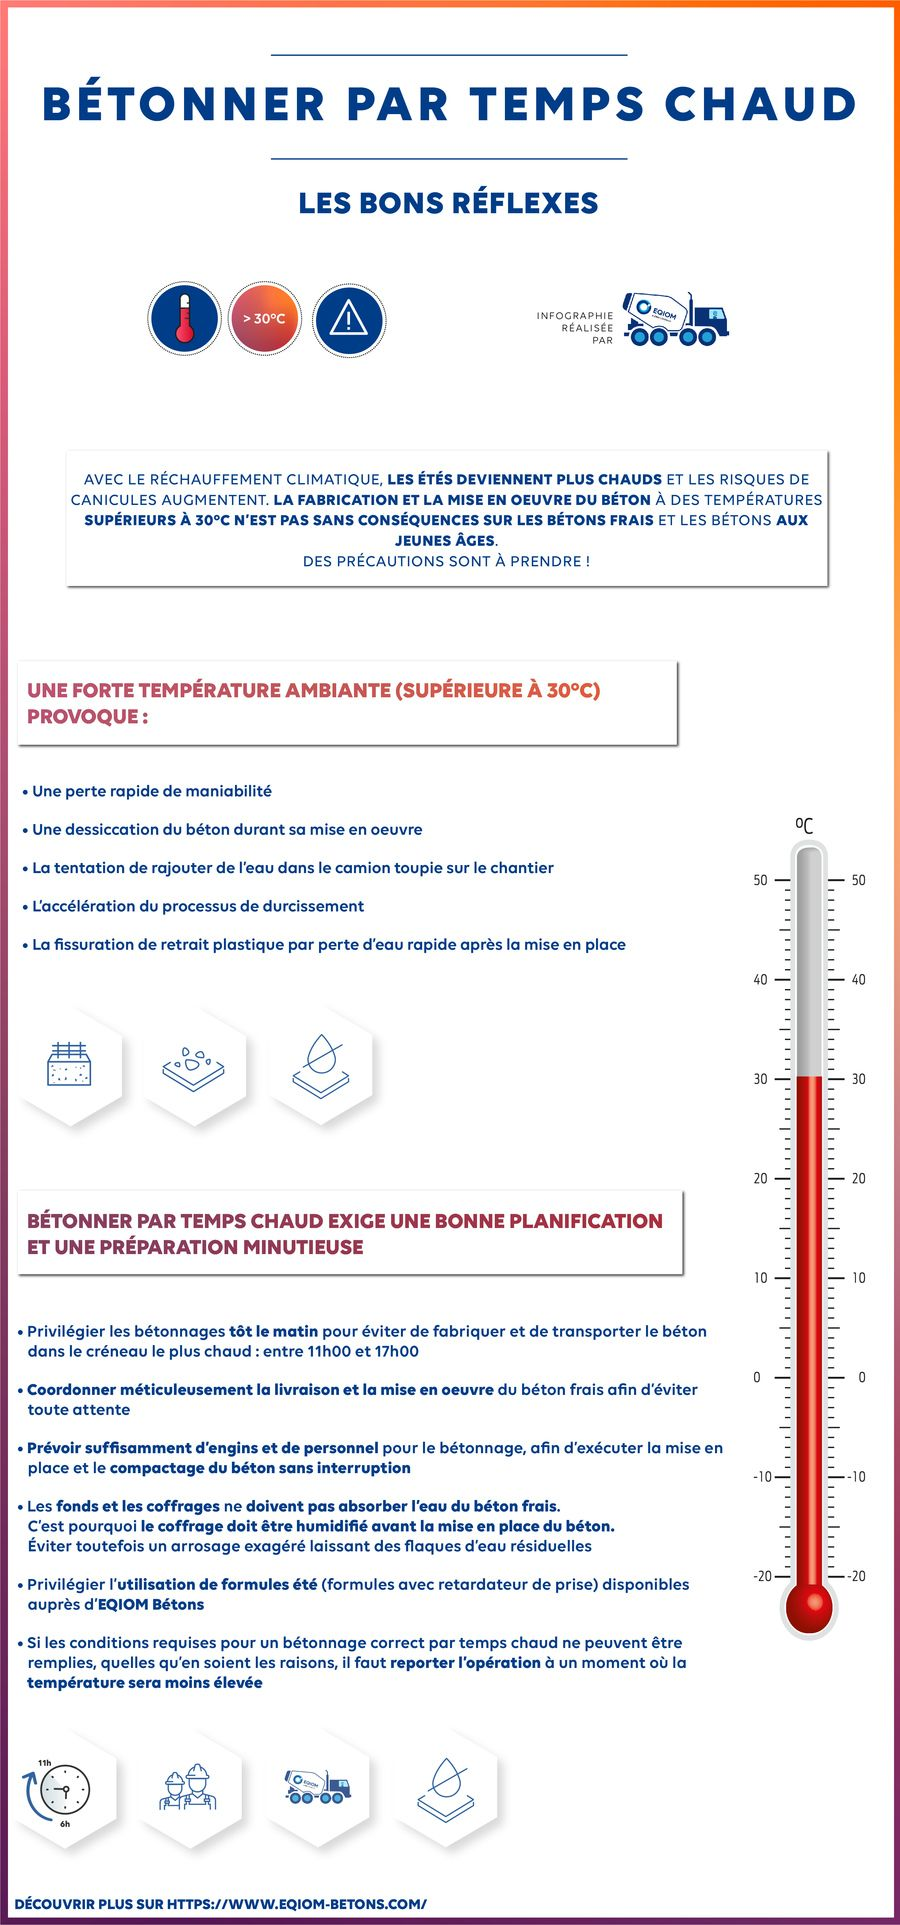 Infographie Betonner Par Temps Chaud Tokster Eqiom Infographie Btob Chaud